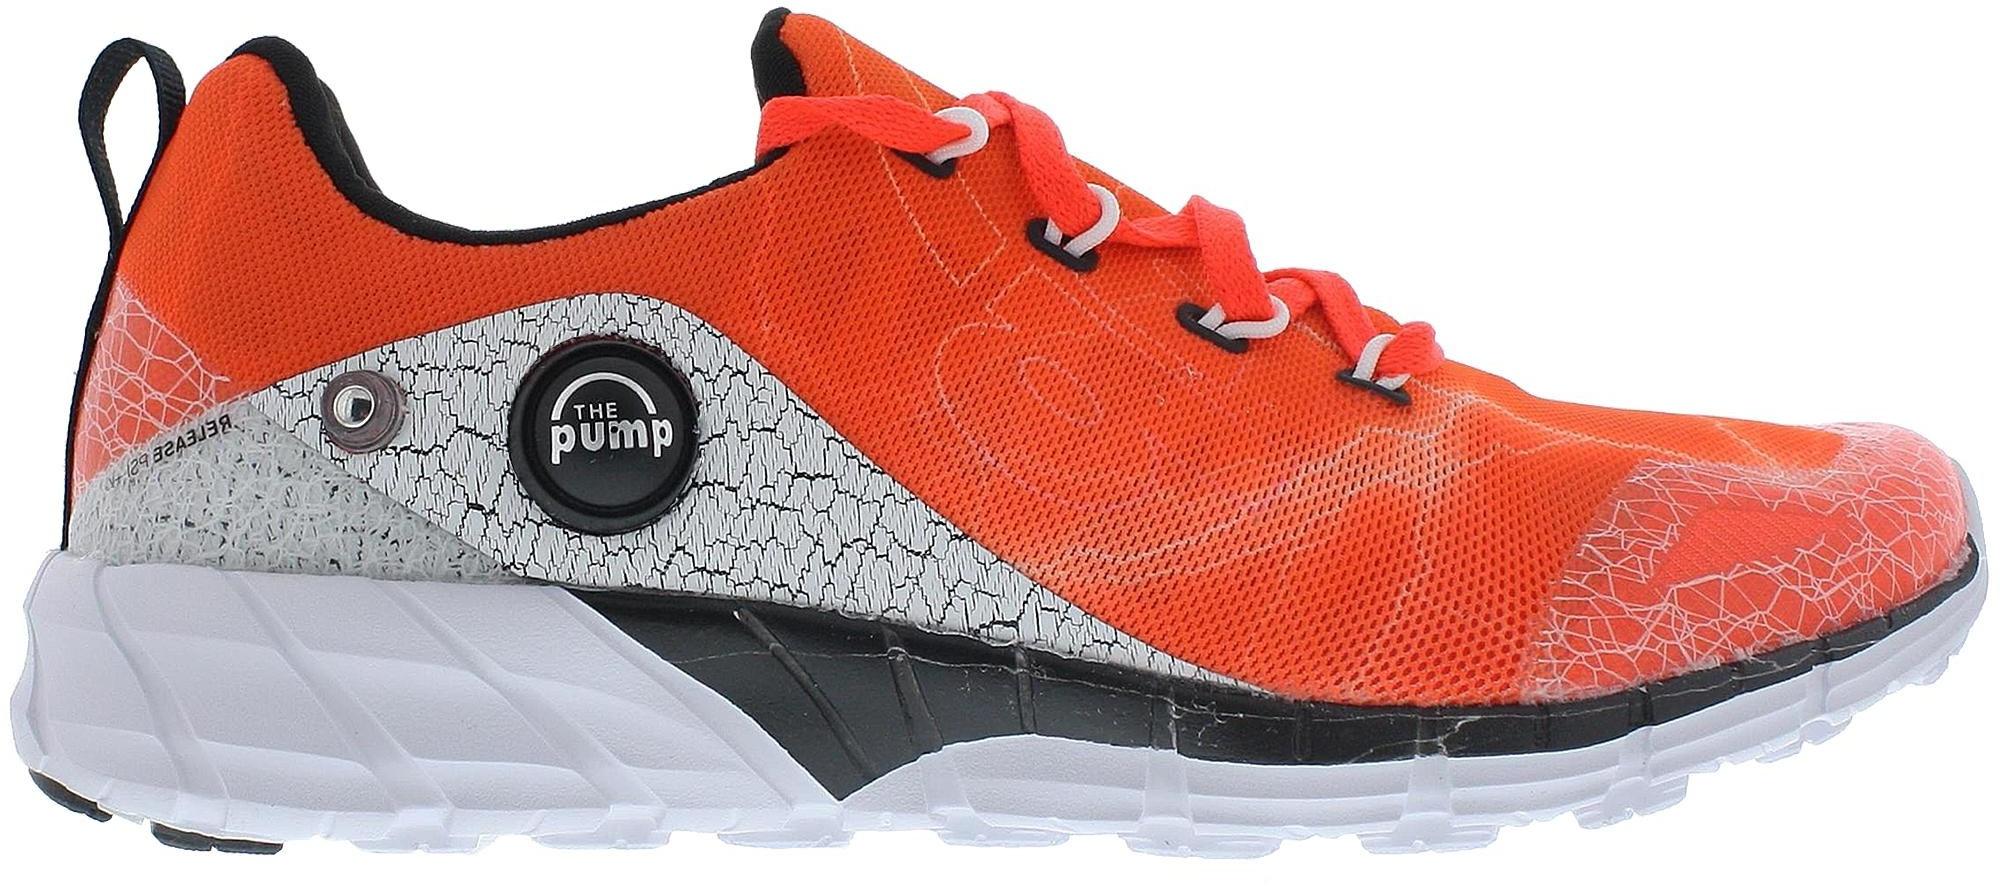 074caea1c690 Reebok running shoes Zpump Fusion 2.0 SP ladies orange - Internet ...